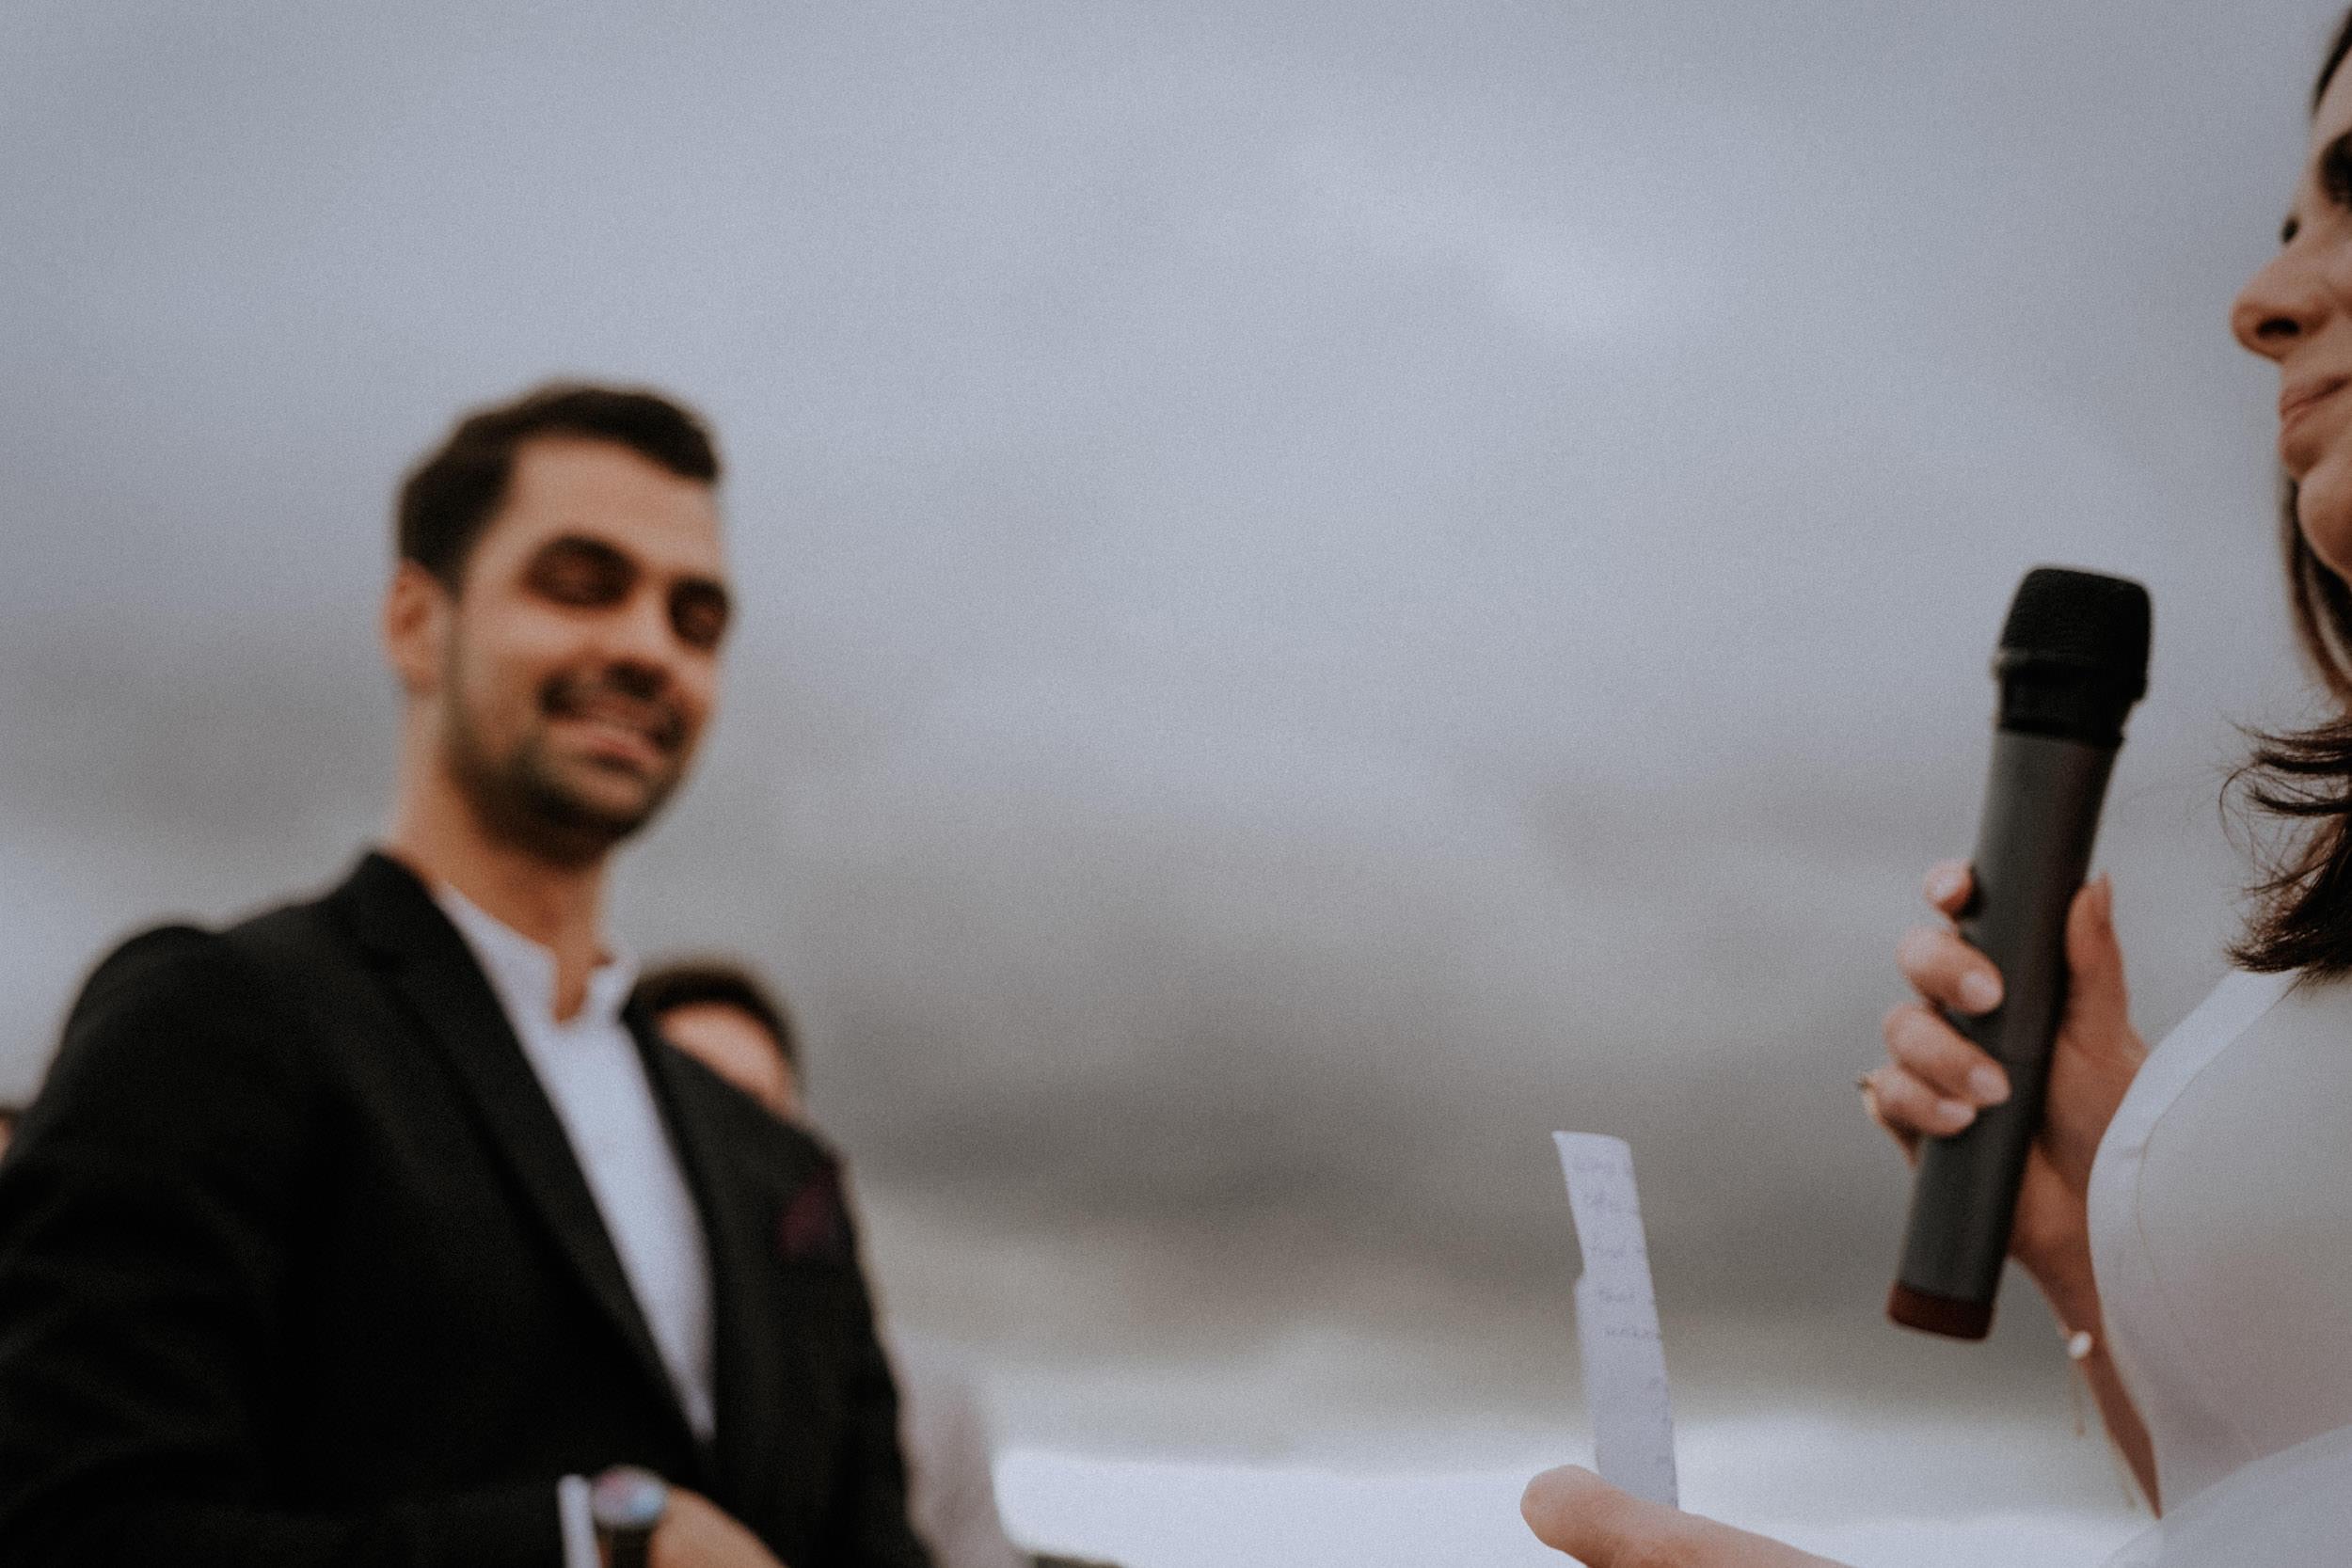 s+j_top_elopement wedding photography_kings & thieves_blog - 288.jpg